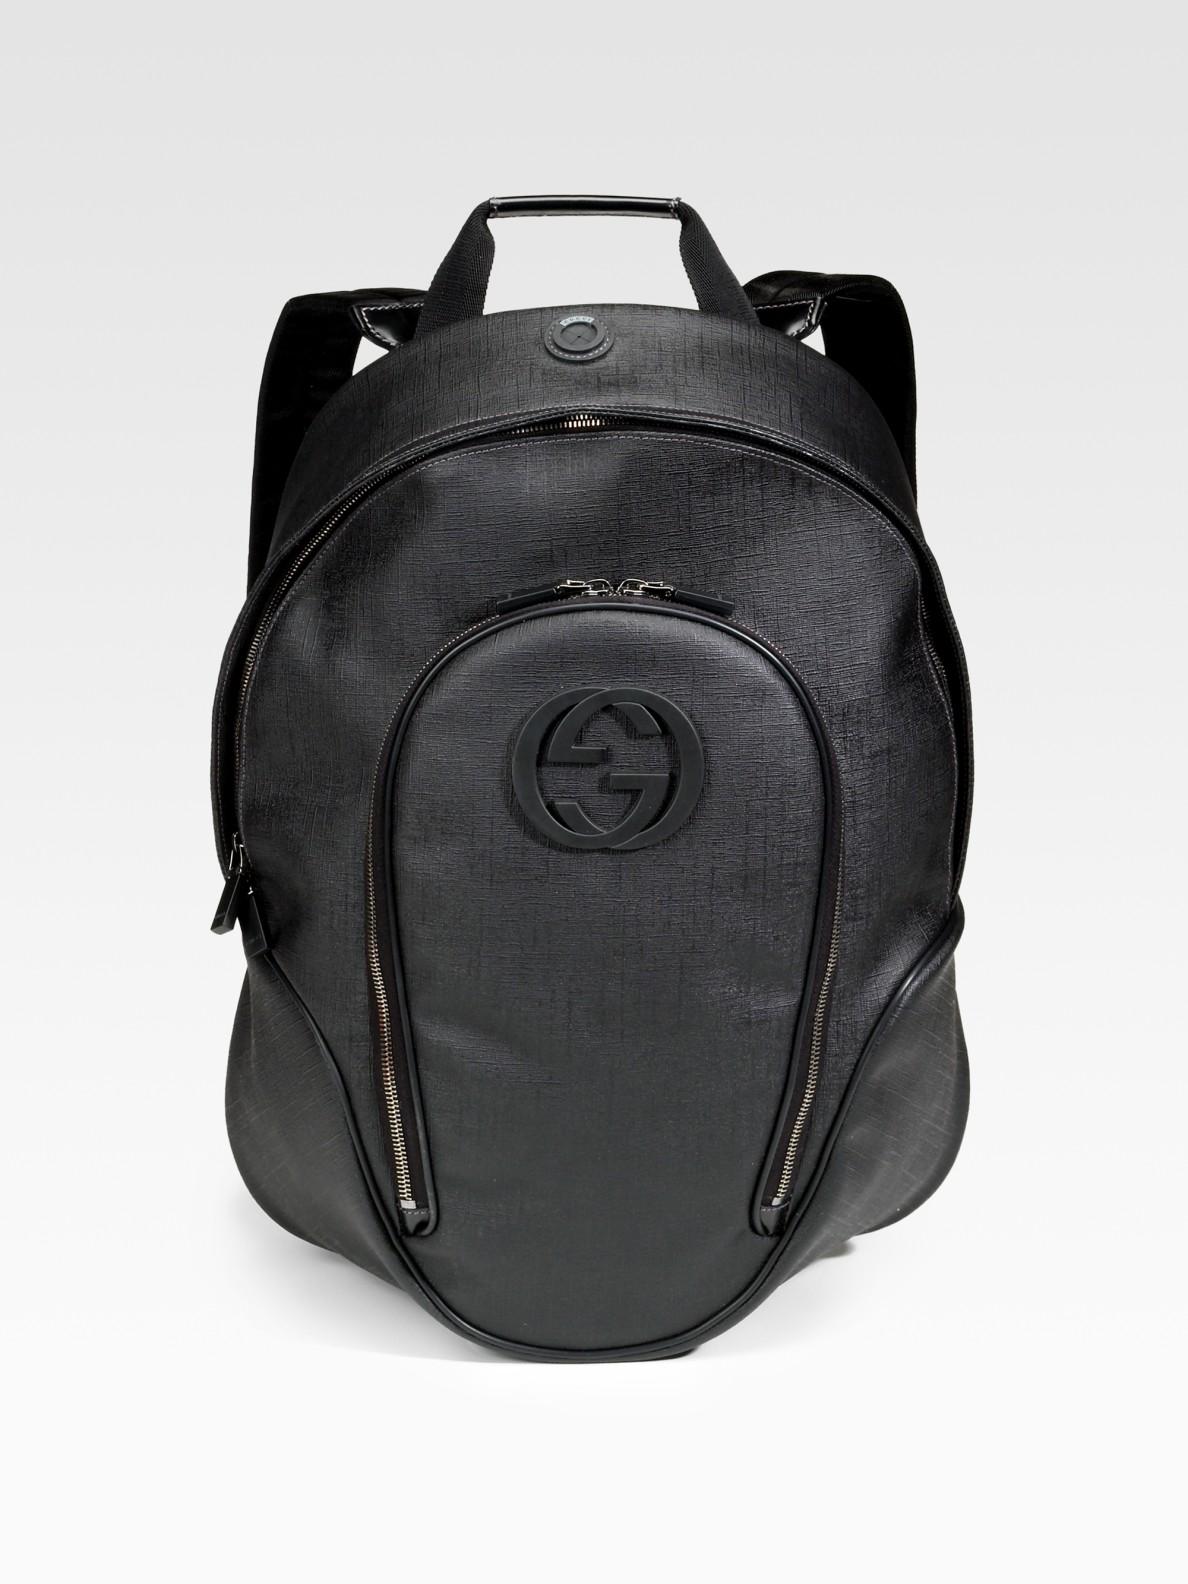 Gucci Bag Mens Backpack   SEMA Data Co-op